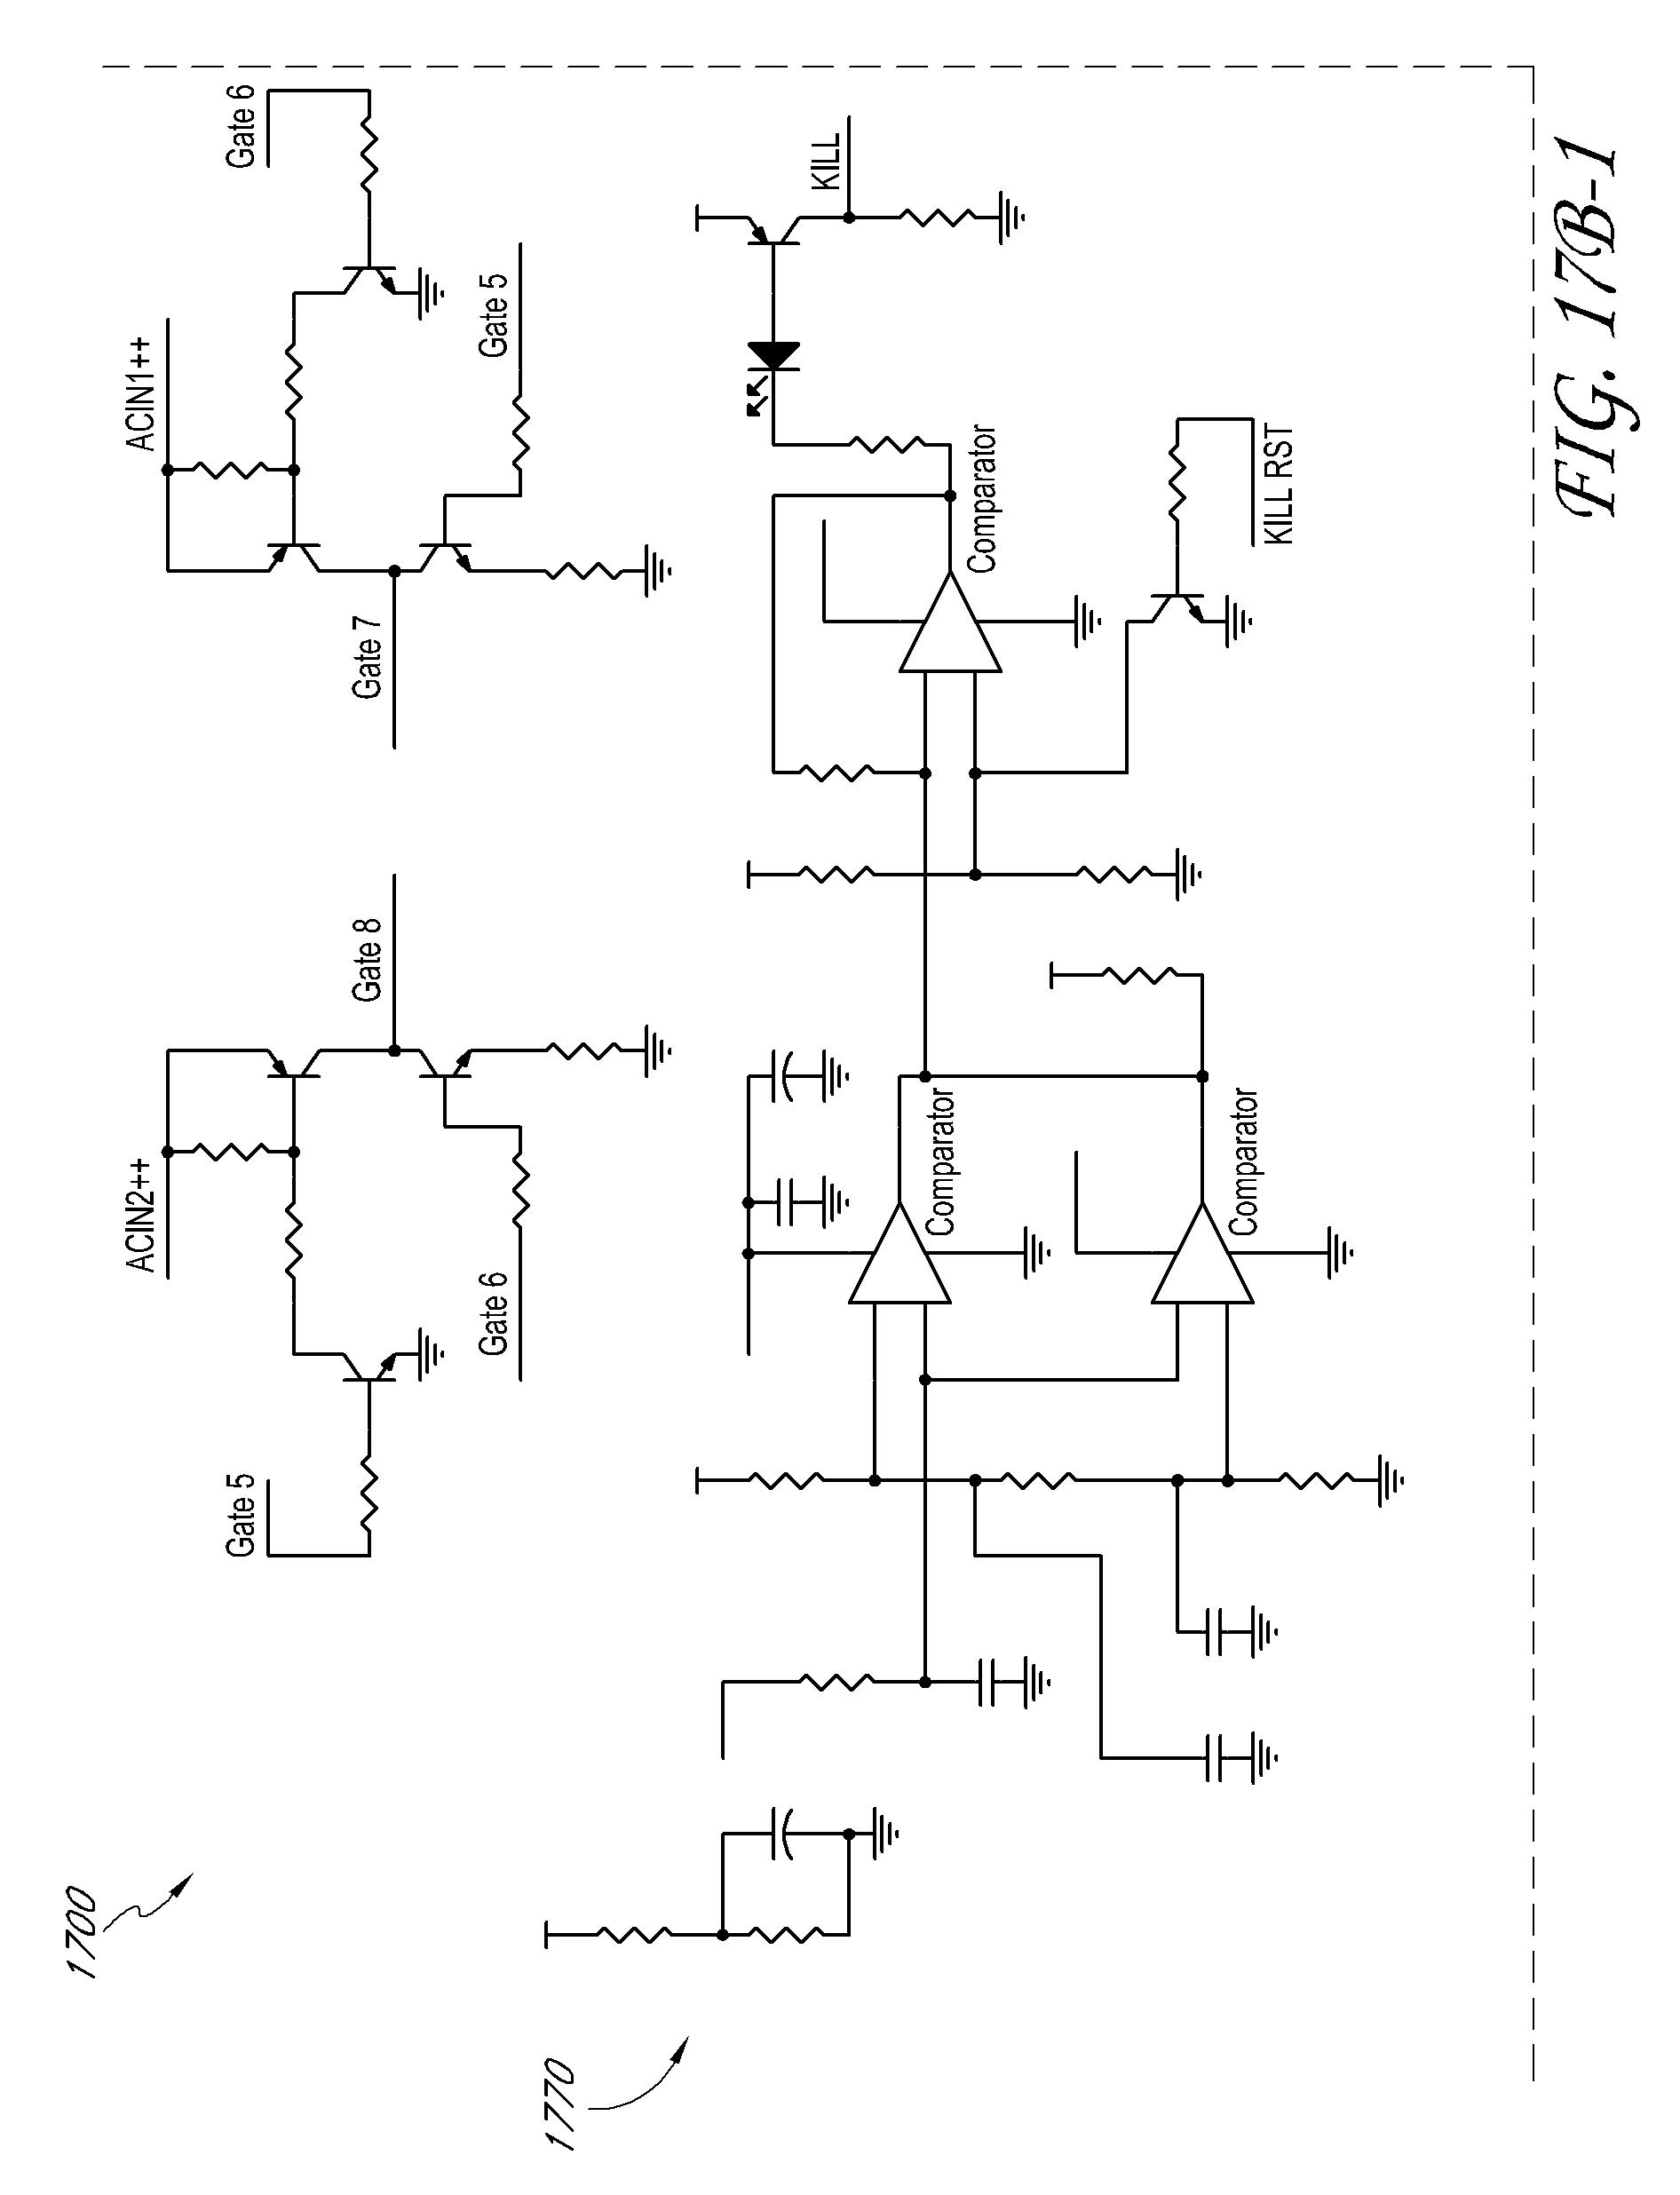 rewiring a boat diagram wiring diagram website